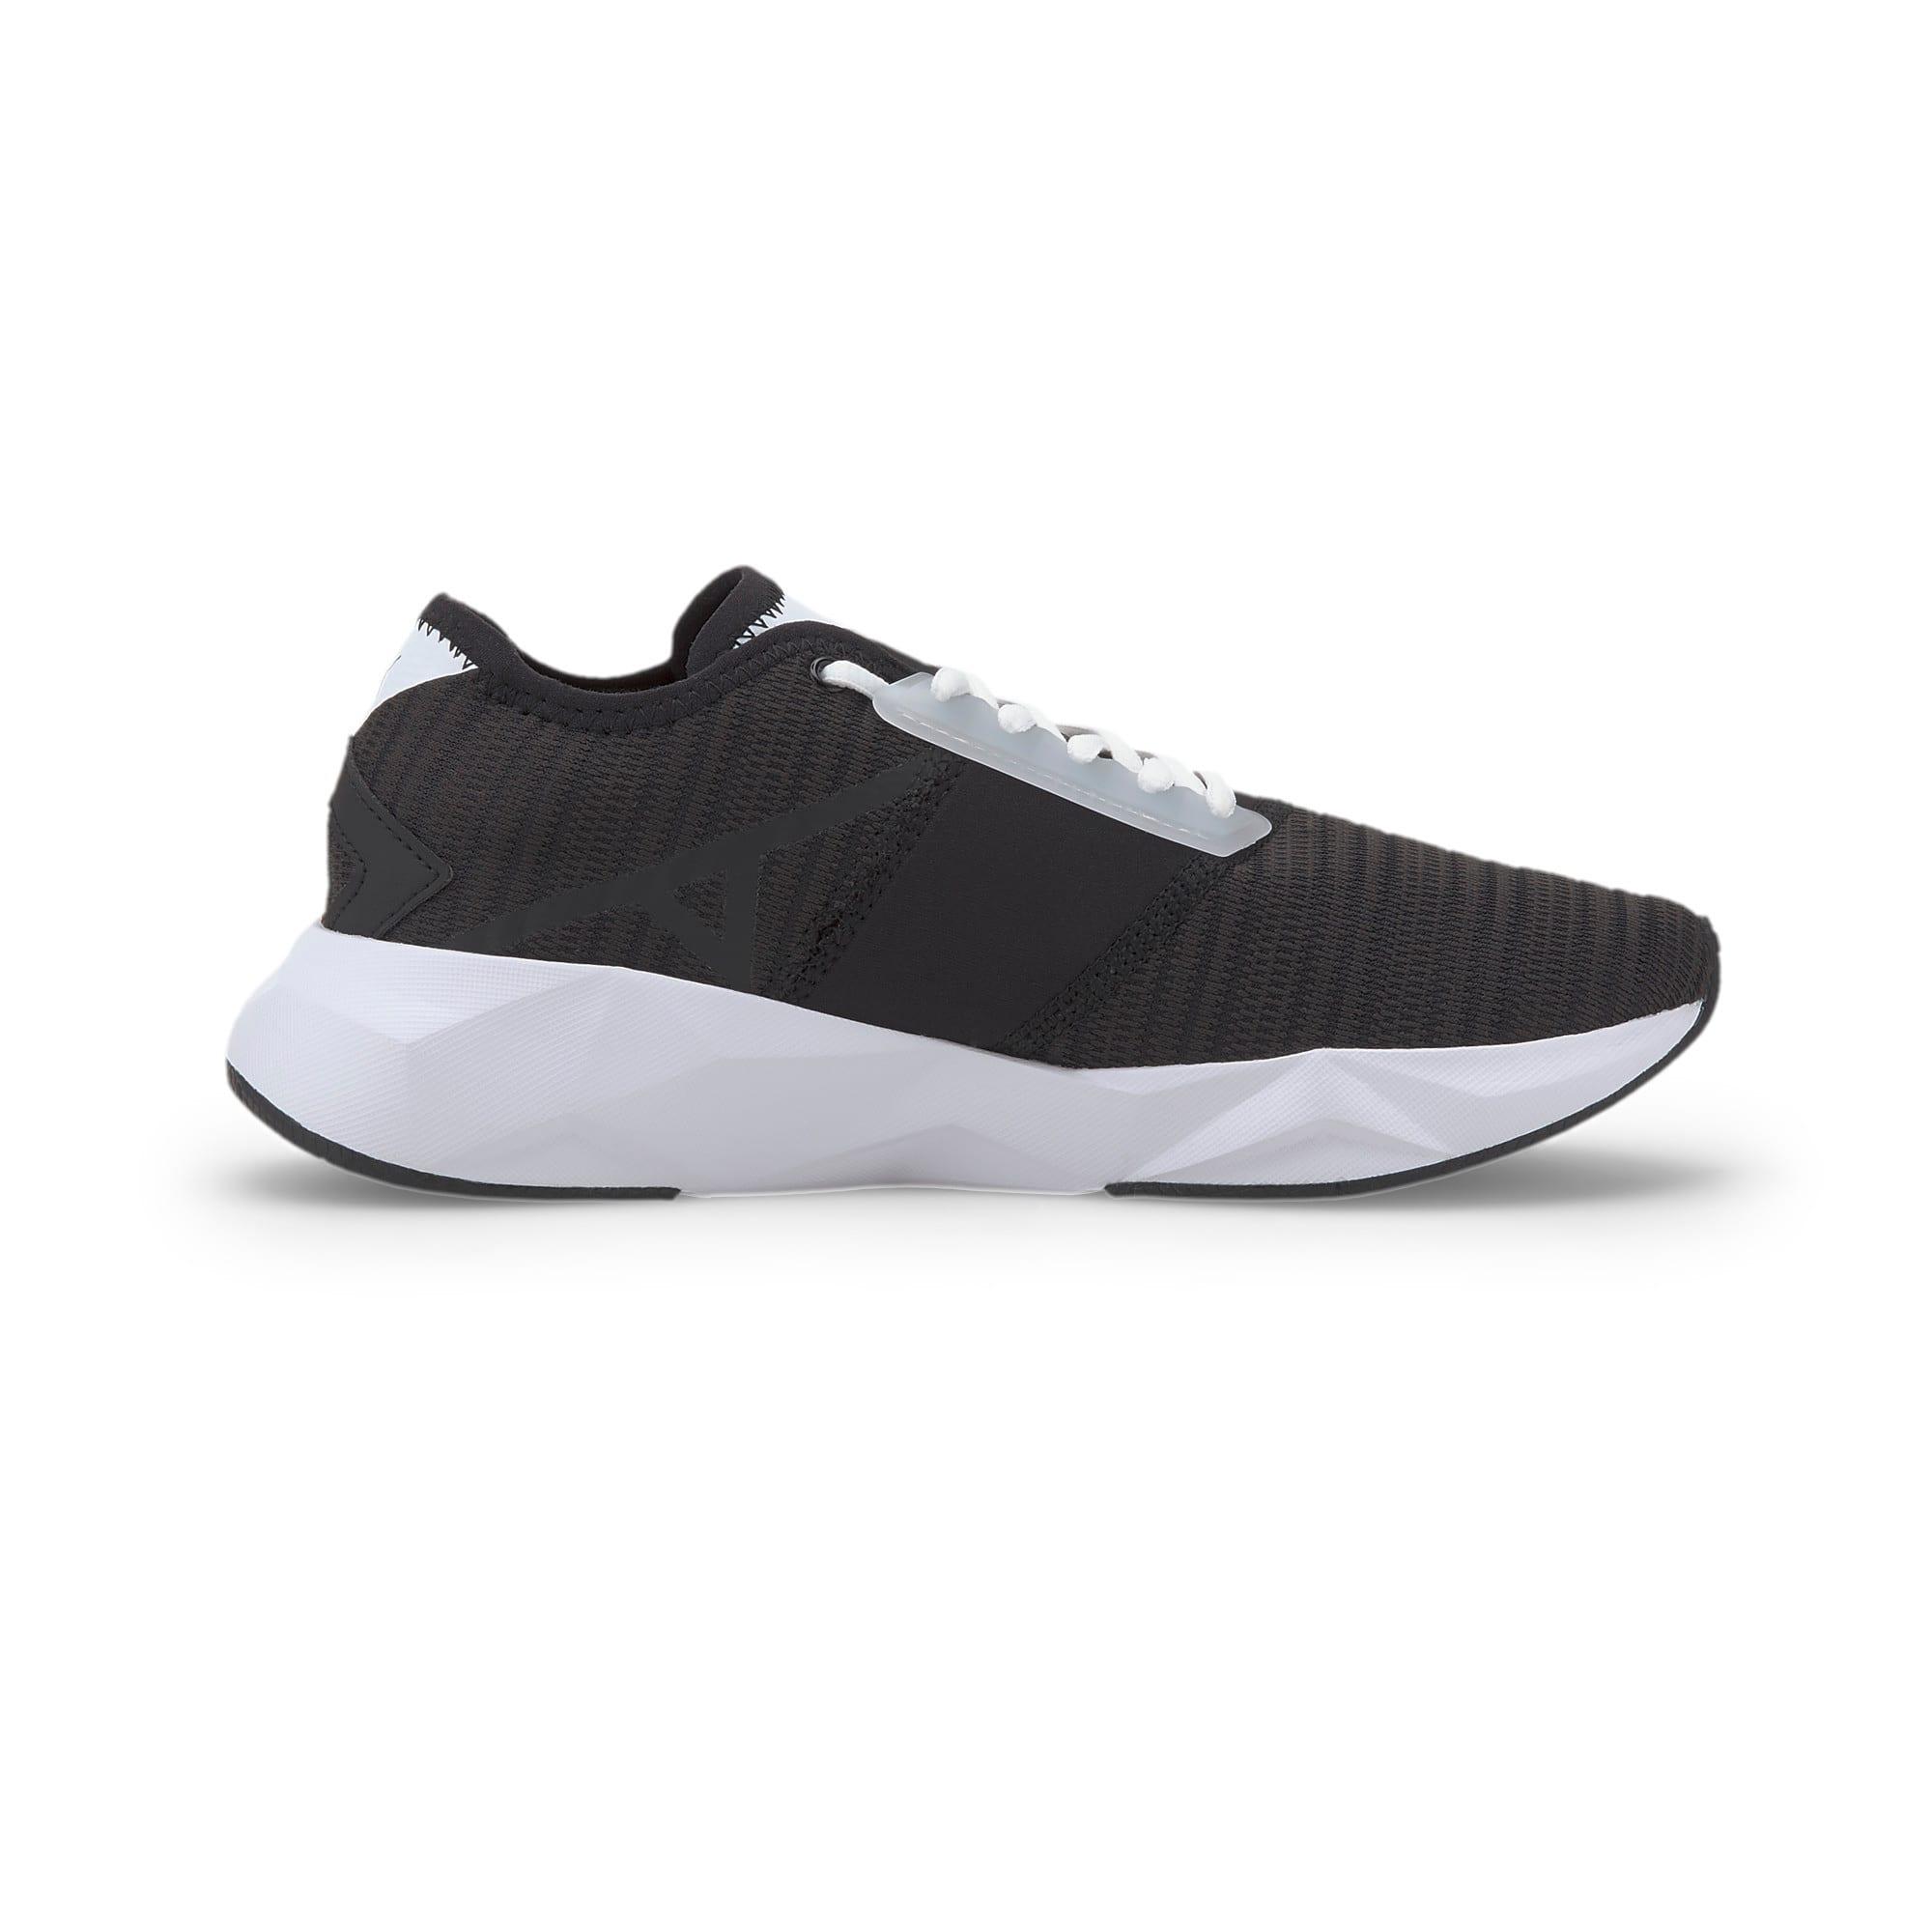 Imagen en miniatura 6 de Zapatillass de mujer CELL Plasmic, Puma Black-Puma White, mediana